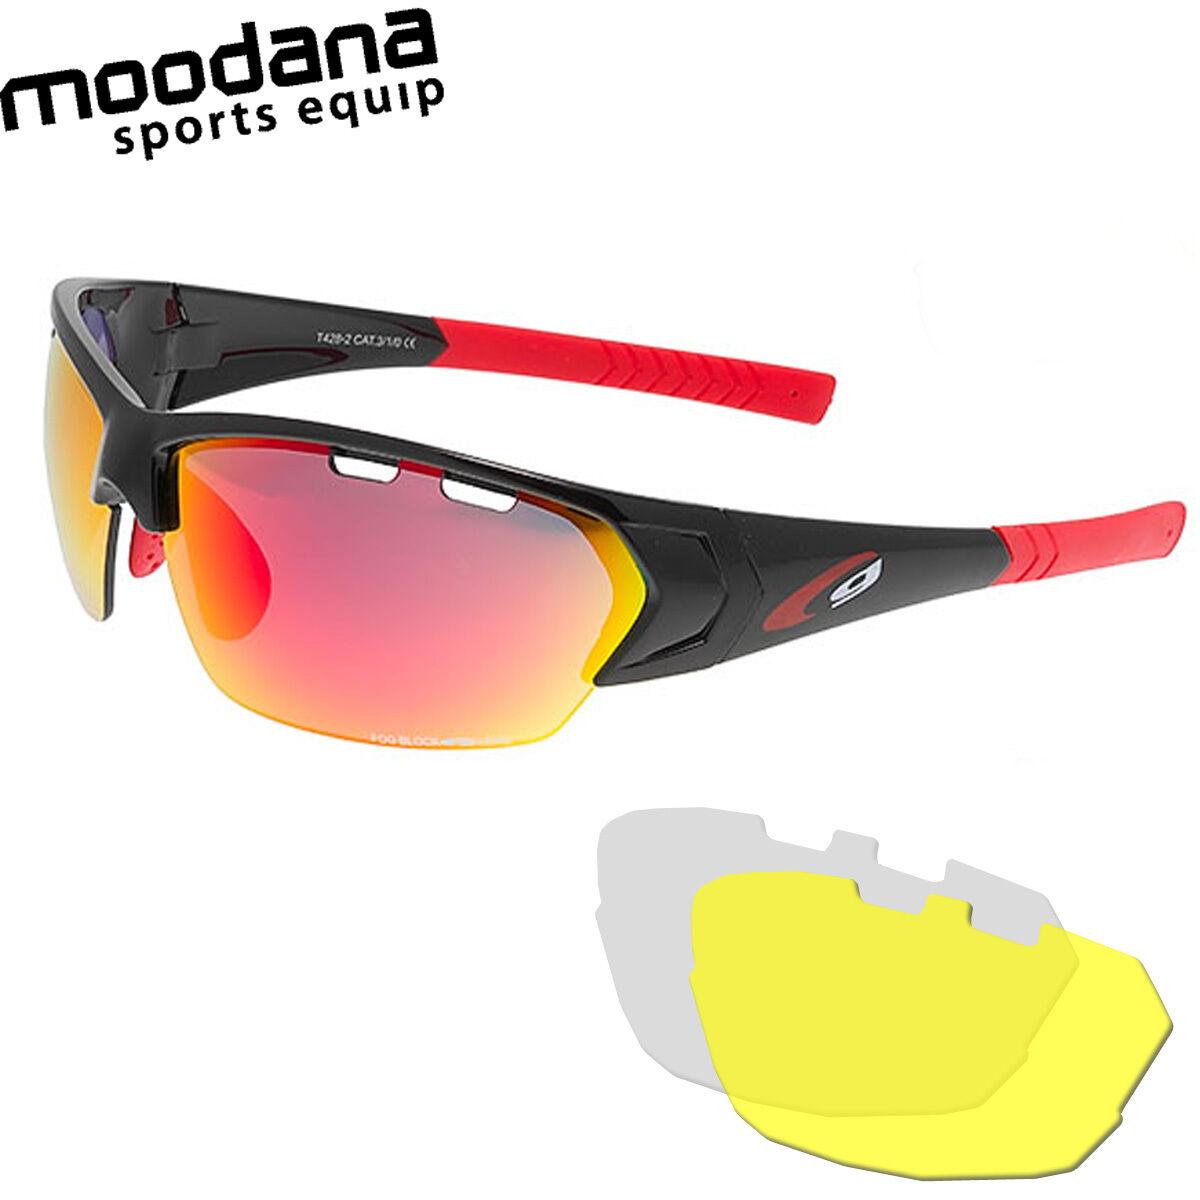 Radbrille Sportbrille Sportbrille Radbrille Multisportbrille mit Wechselscheiben + Band 9a826e